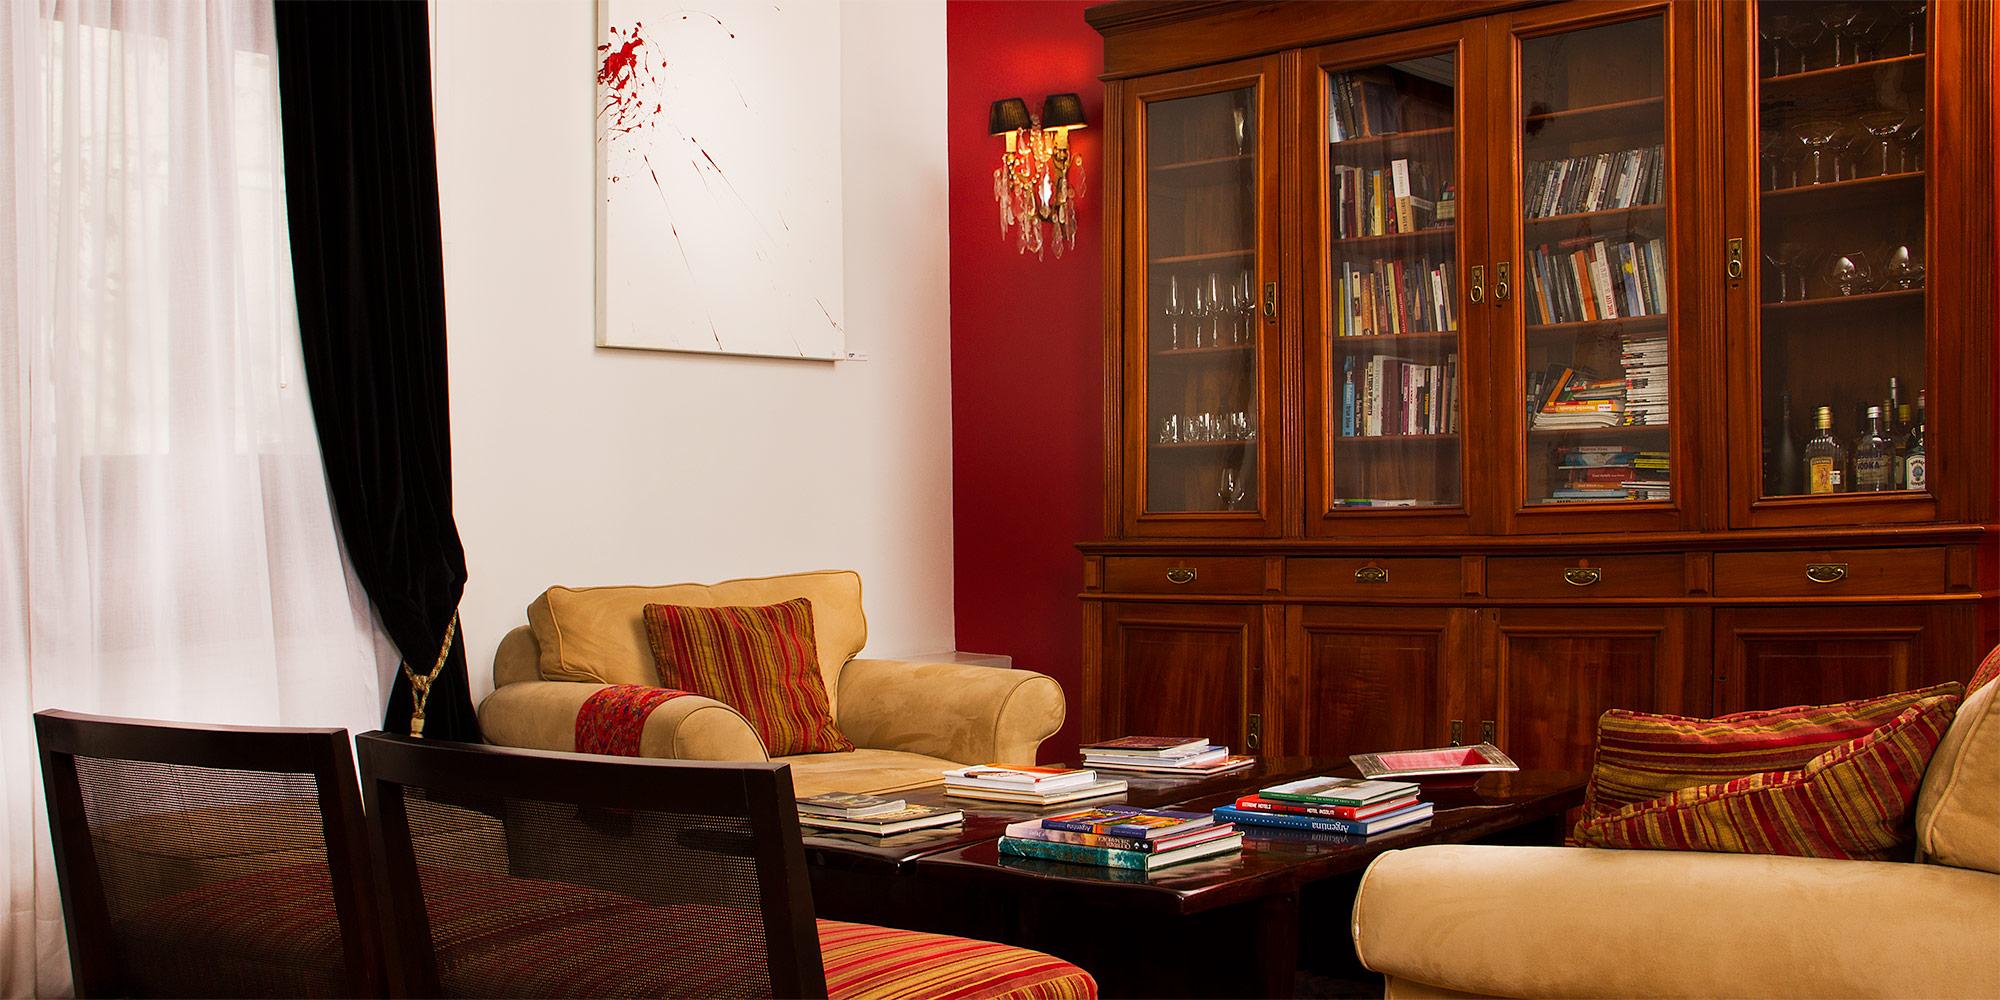 Magnolia-Hotel-Boutique-Palermo-Buenos-Aires-design-by-Guapo-15